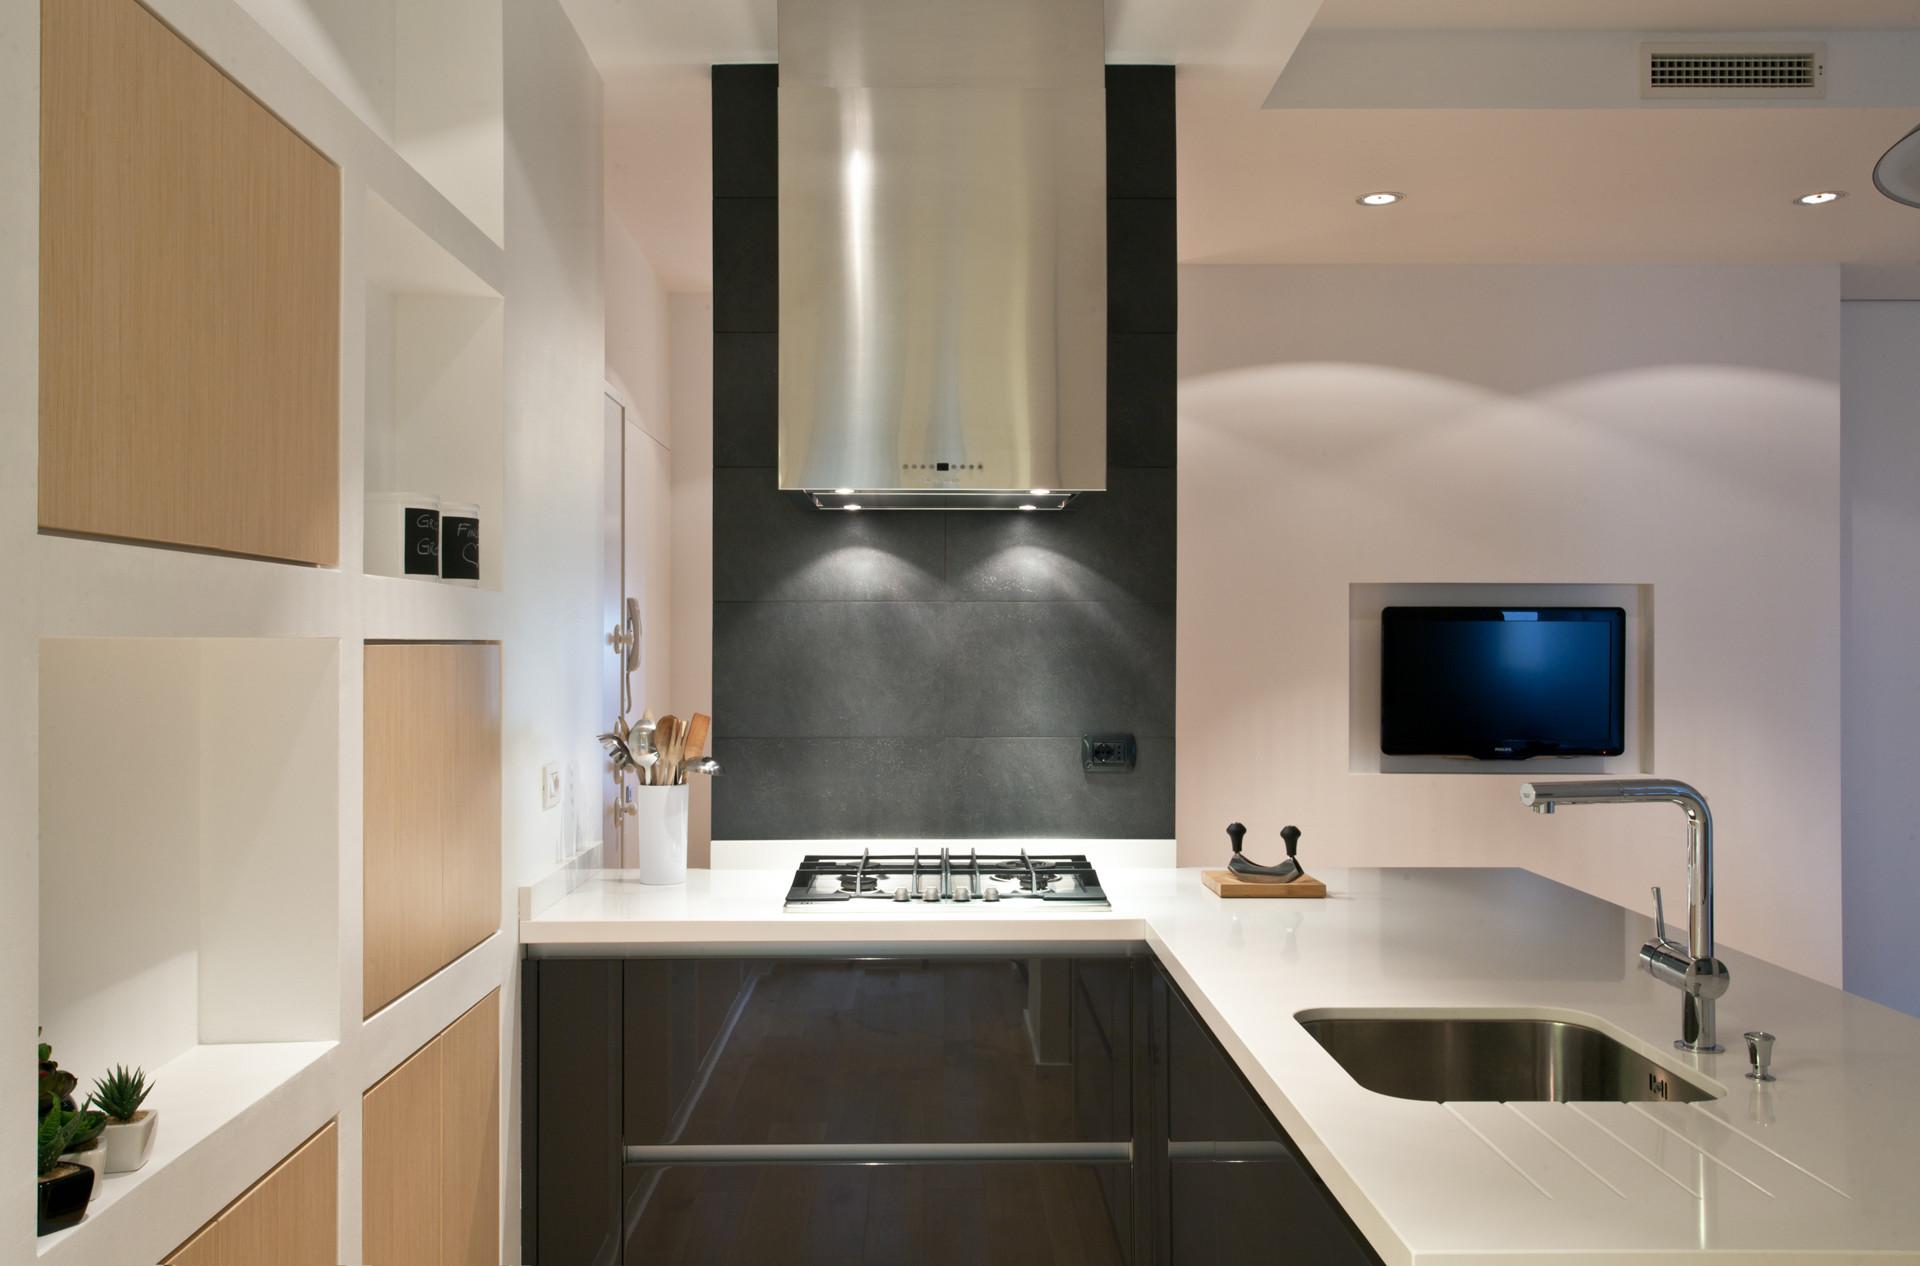 Wisp-Architects- Oxilia Apartment 5